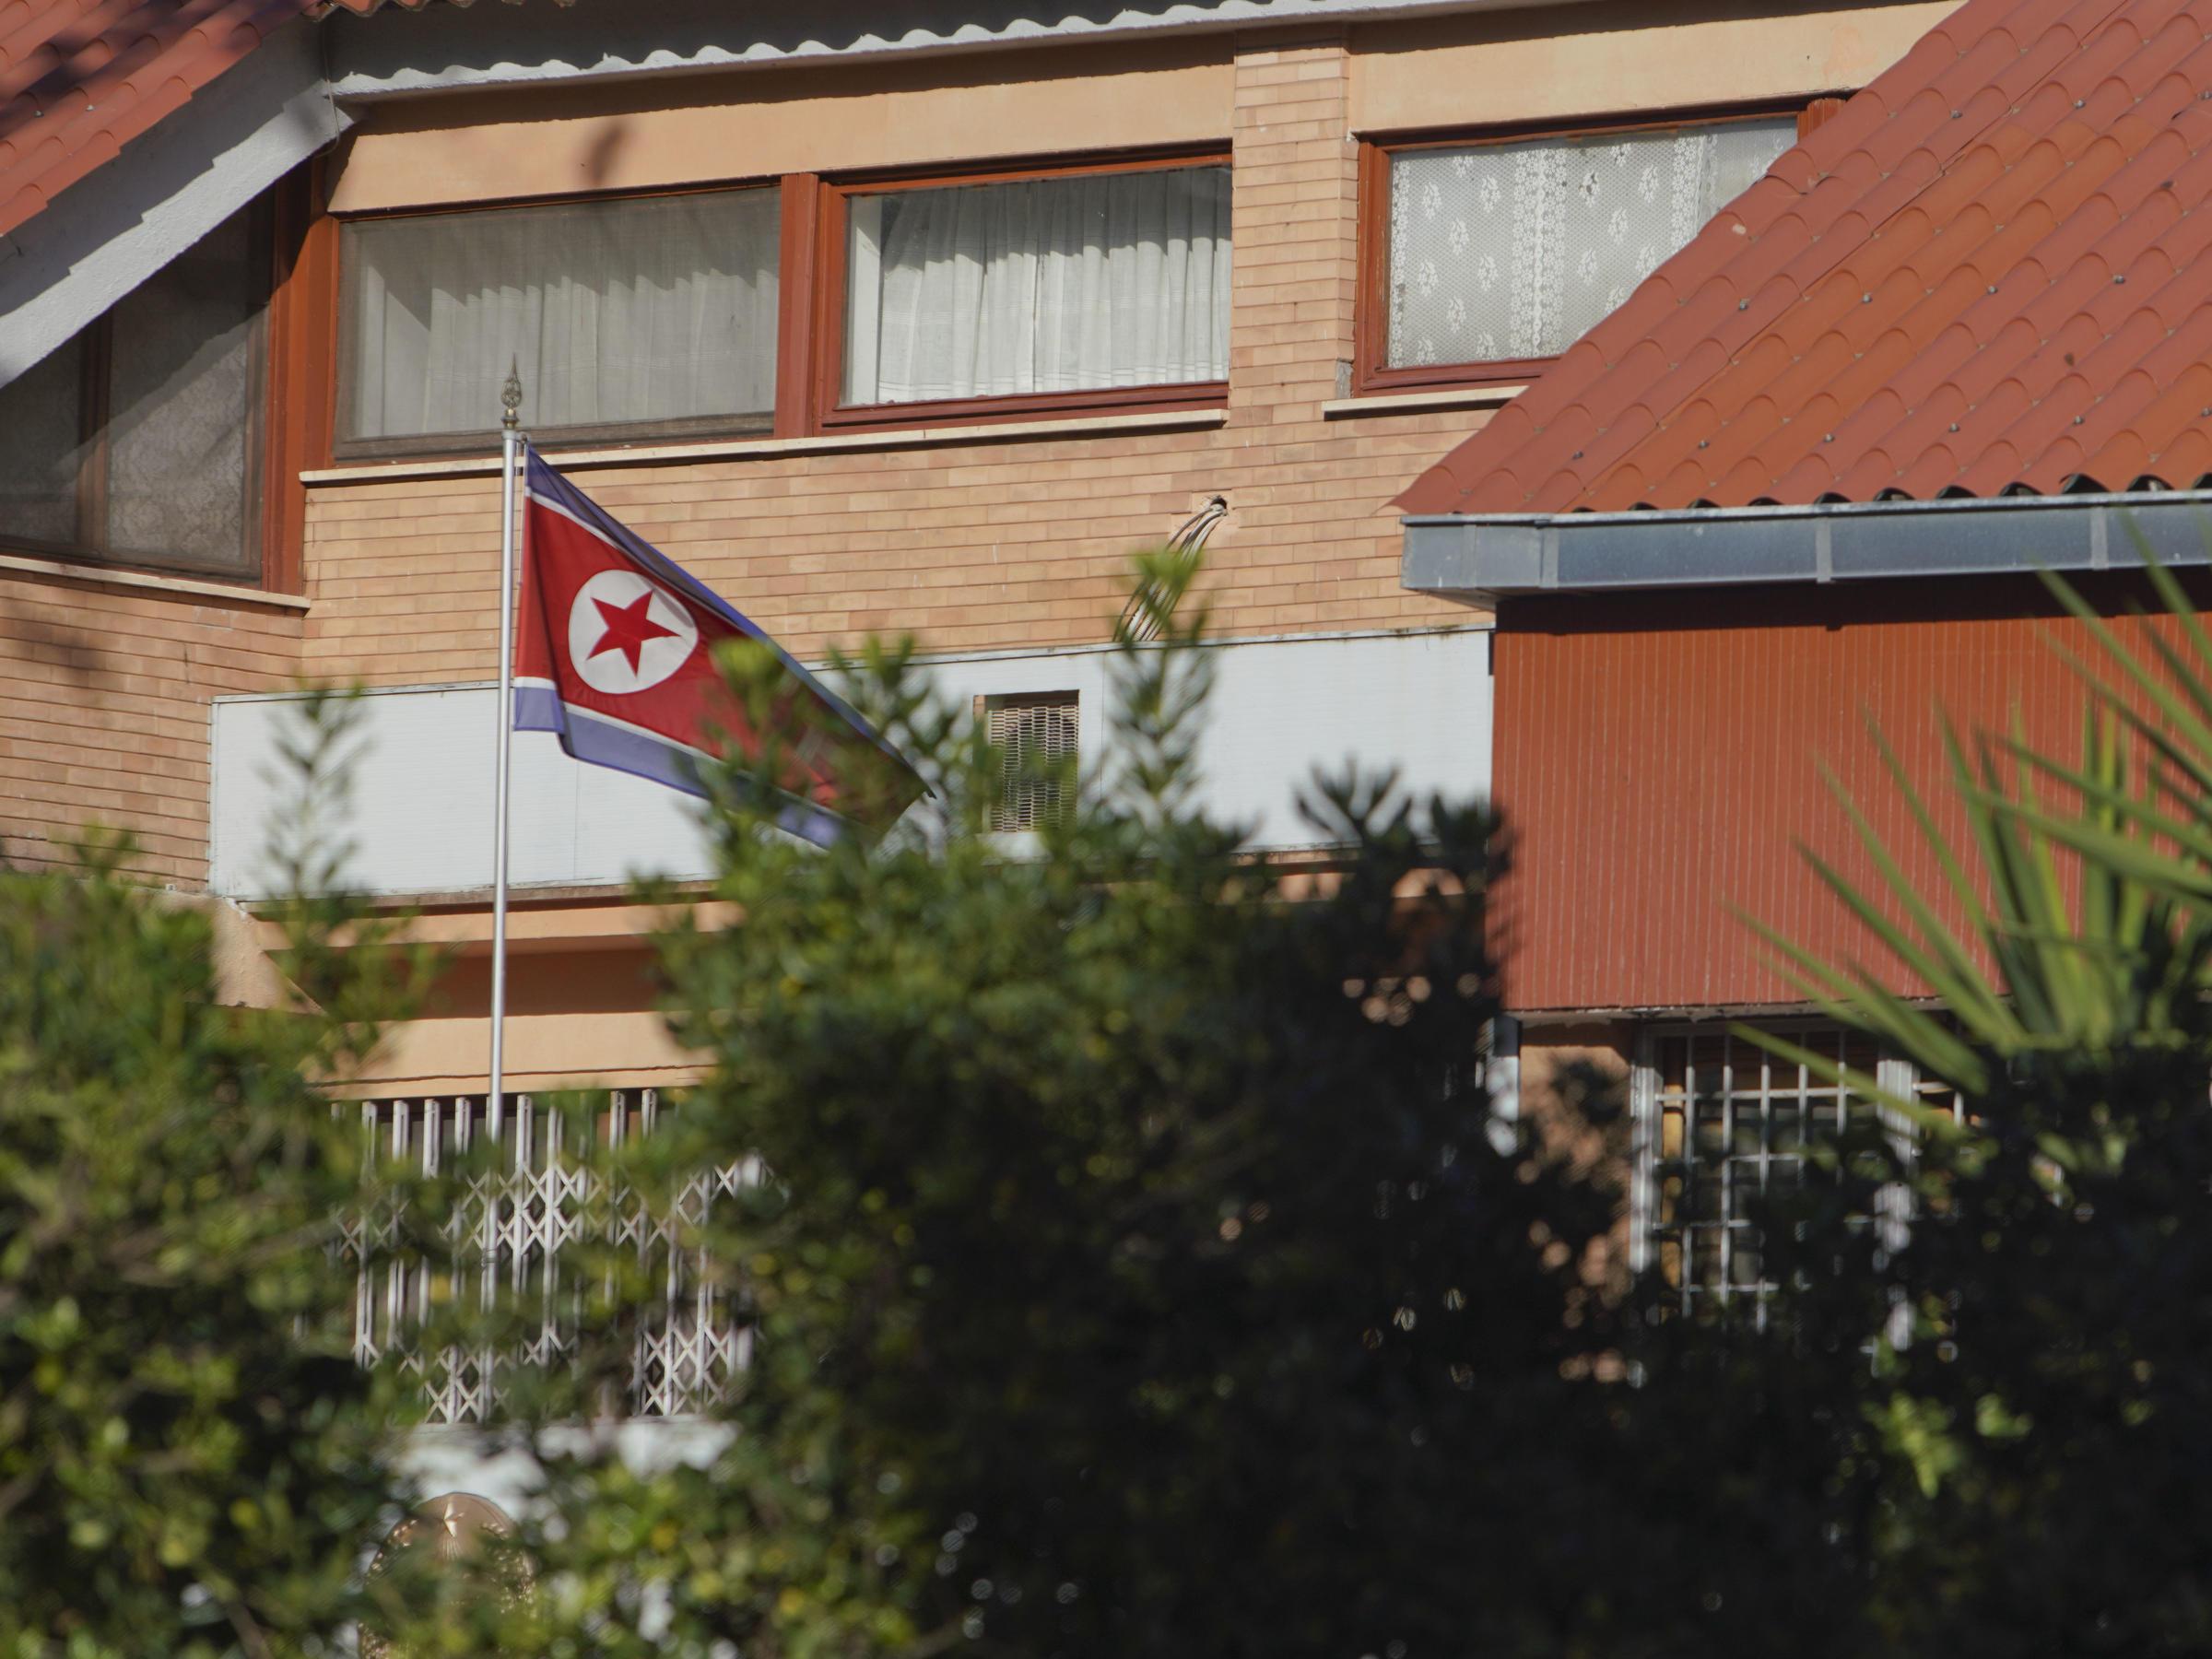 North Korean diplomat in Italy 'seeking asylum'